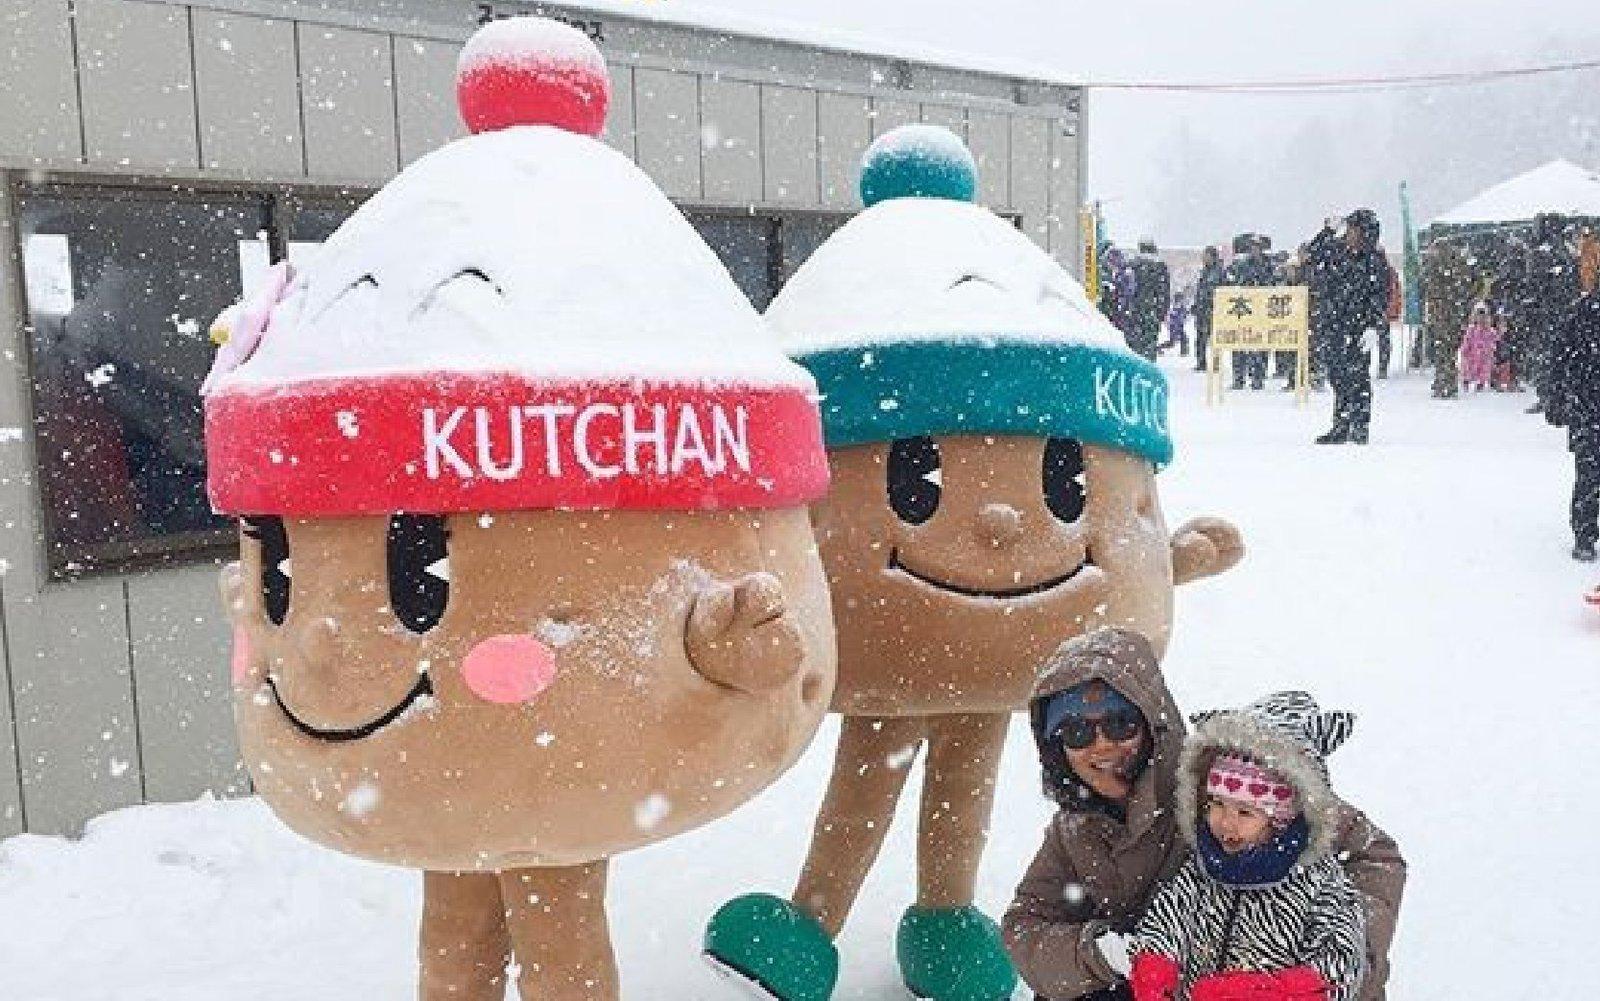 jagatakun and jagakochan at yukitopia snow festival kutchan